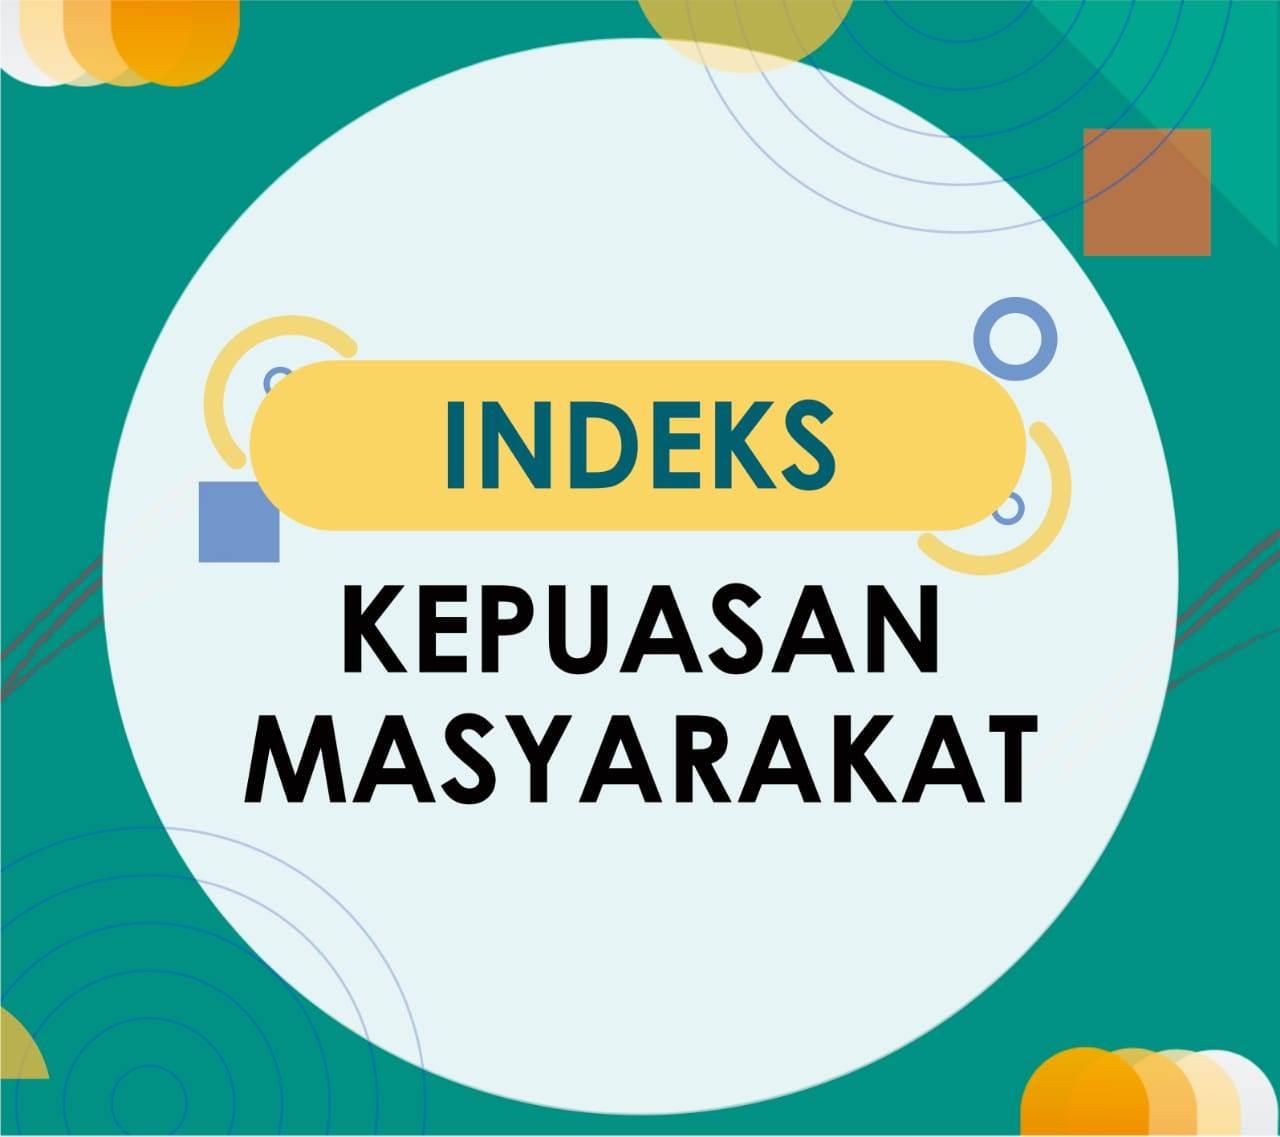 Hasil Survey Kepuasan Masyarakat Skm Kecamatan Sukorejo Kota Blitar